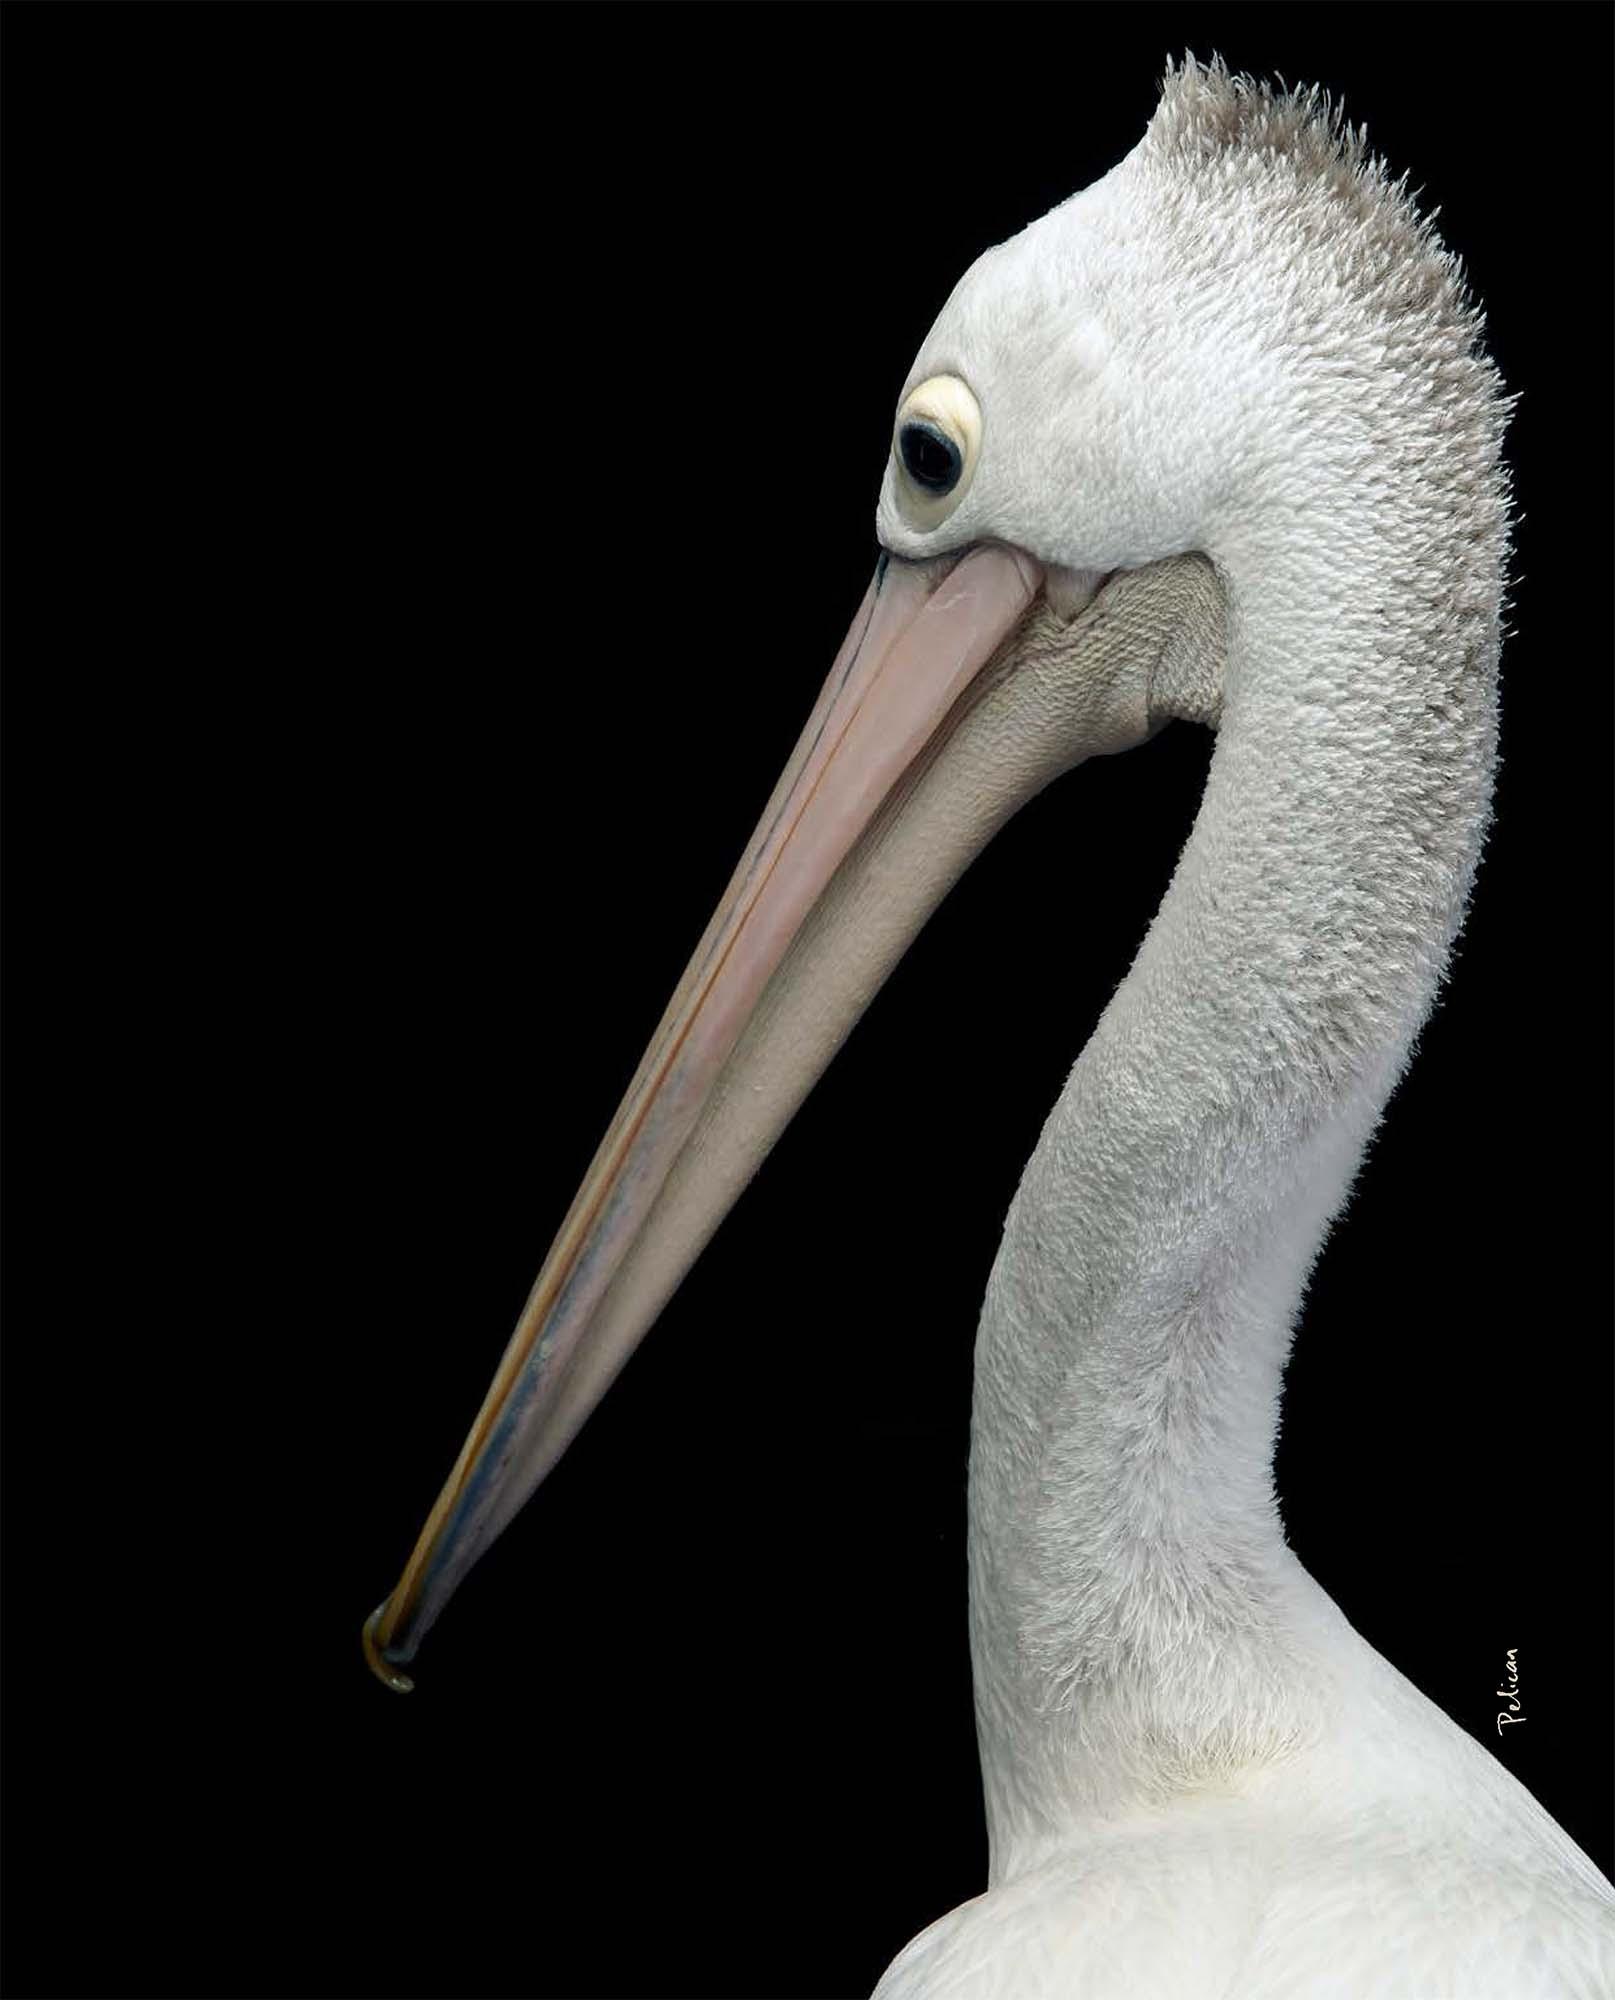 BIRD Gary Heery Book-completemmockup-129.jpg